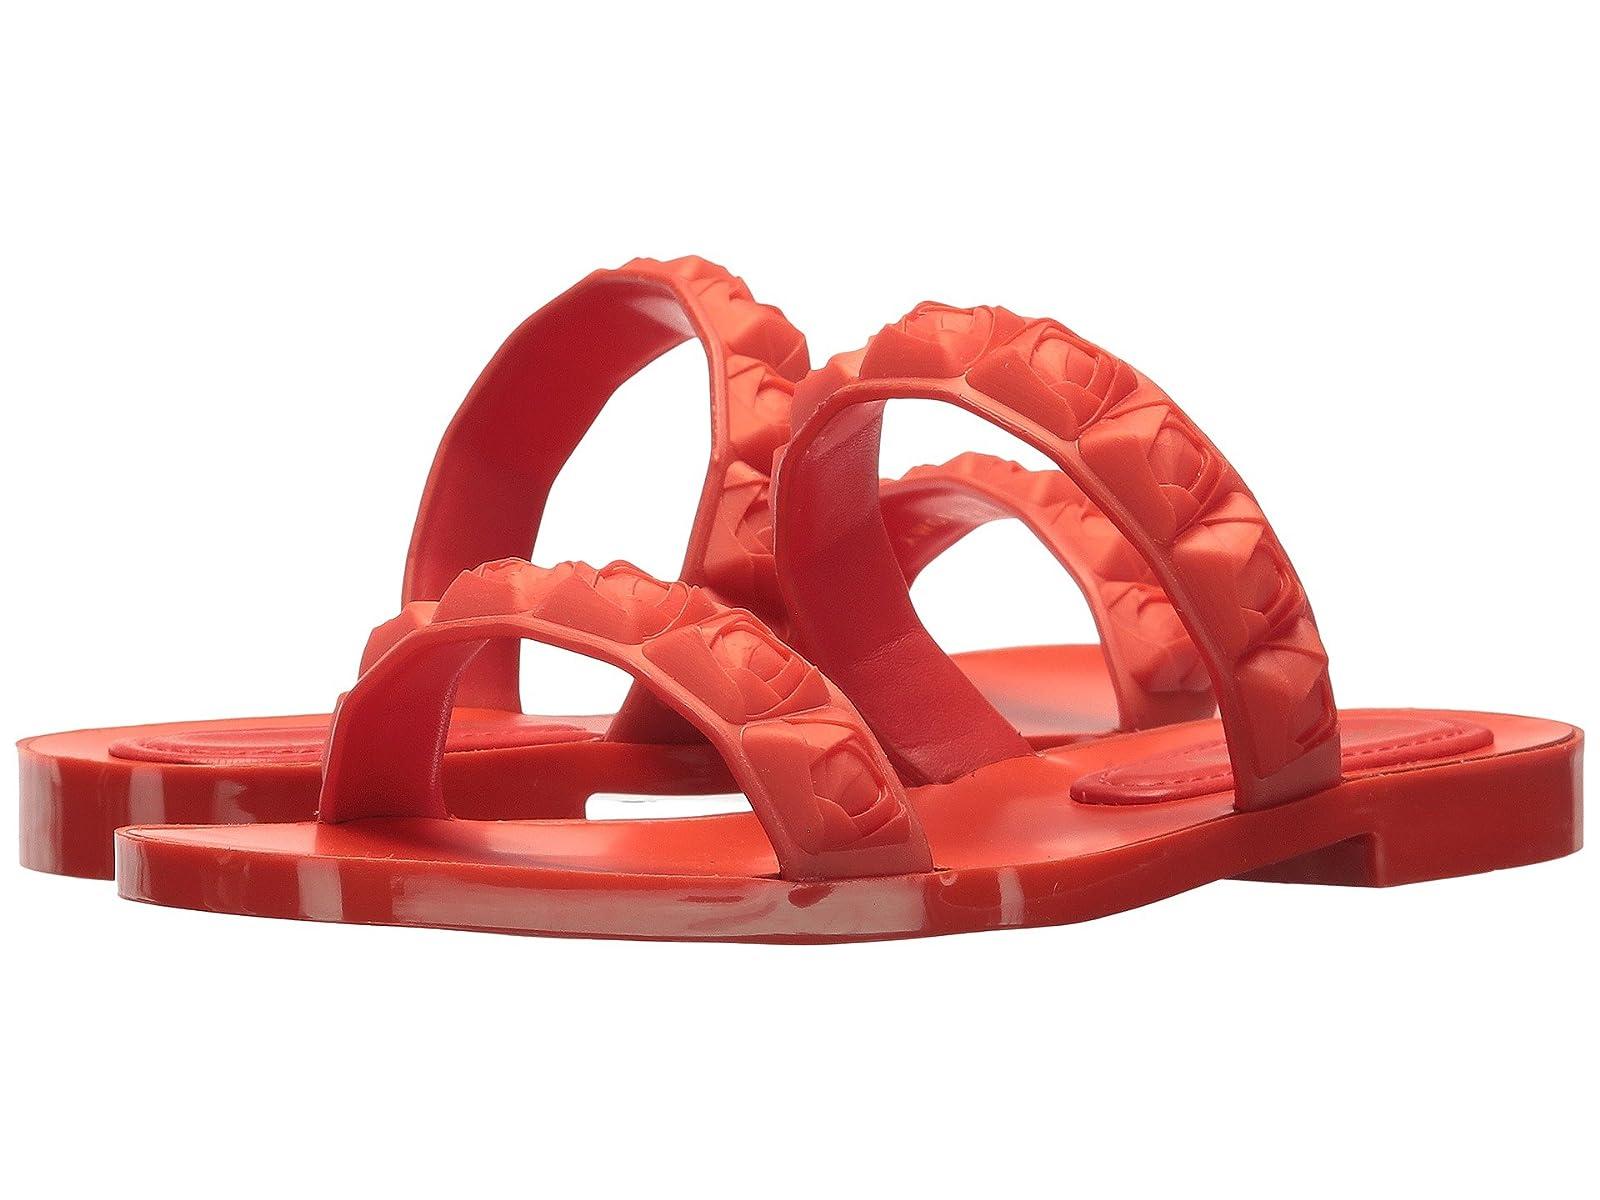 Stuart Weitzman RositaCheap and distinctive eye-catching shoes